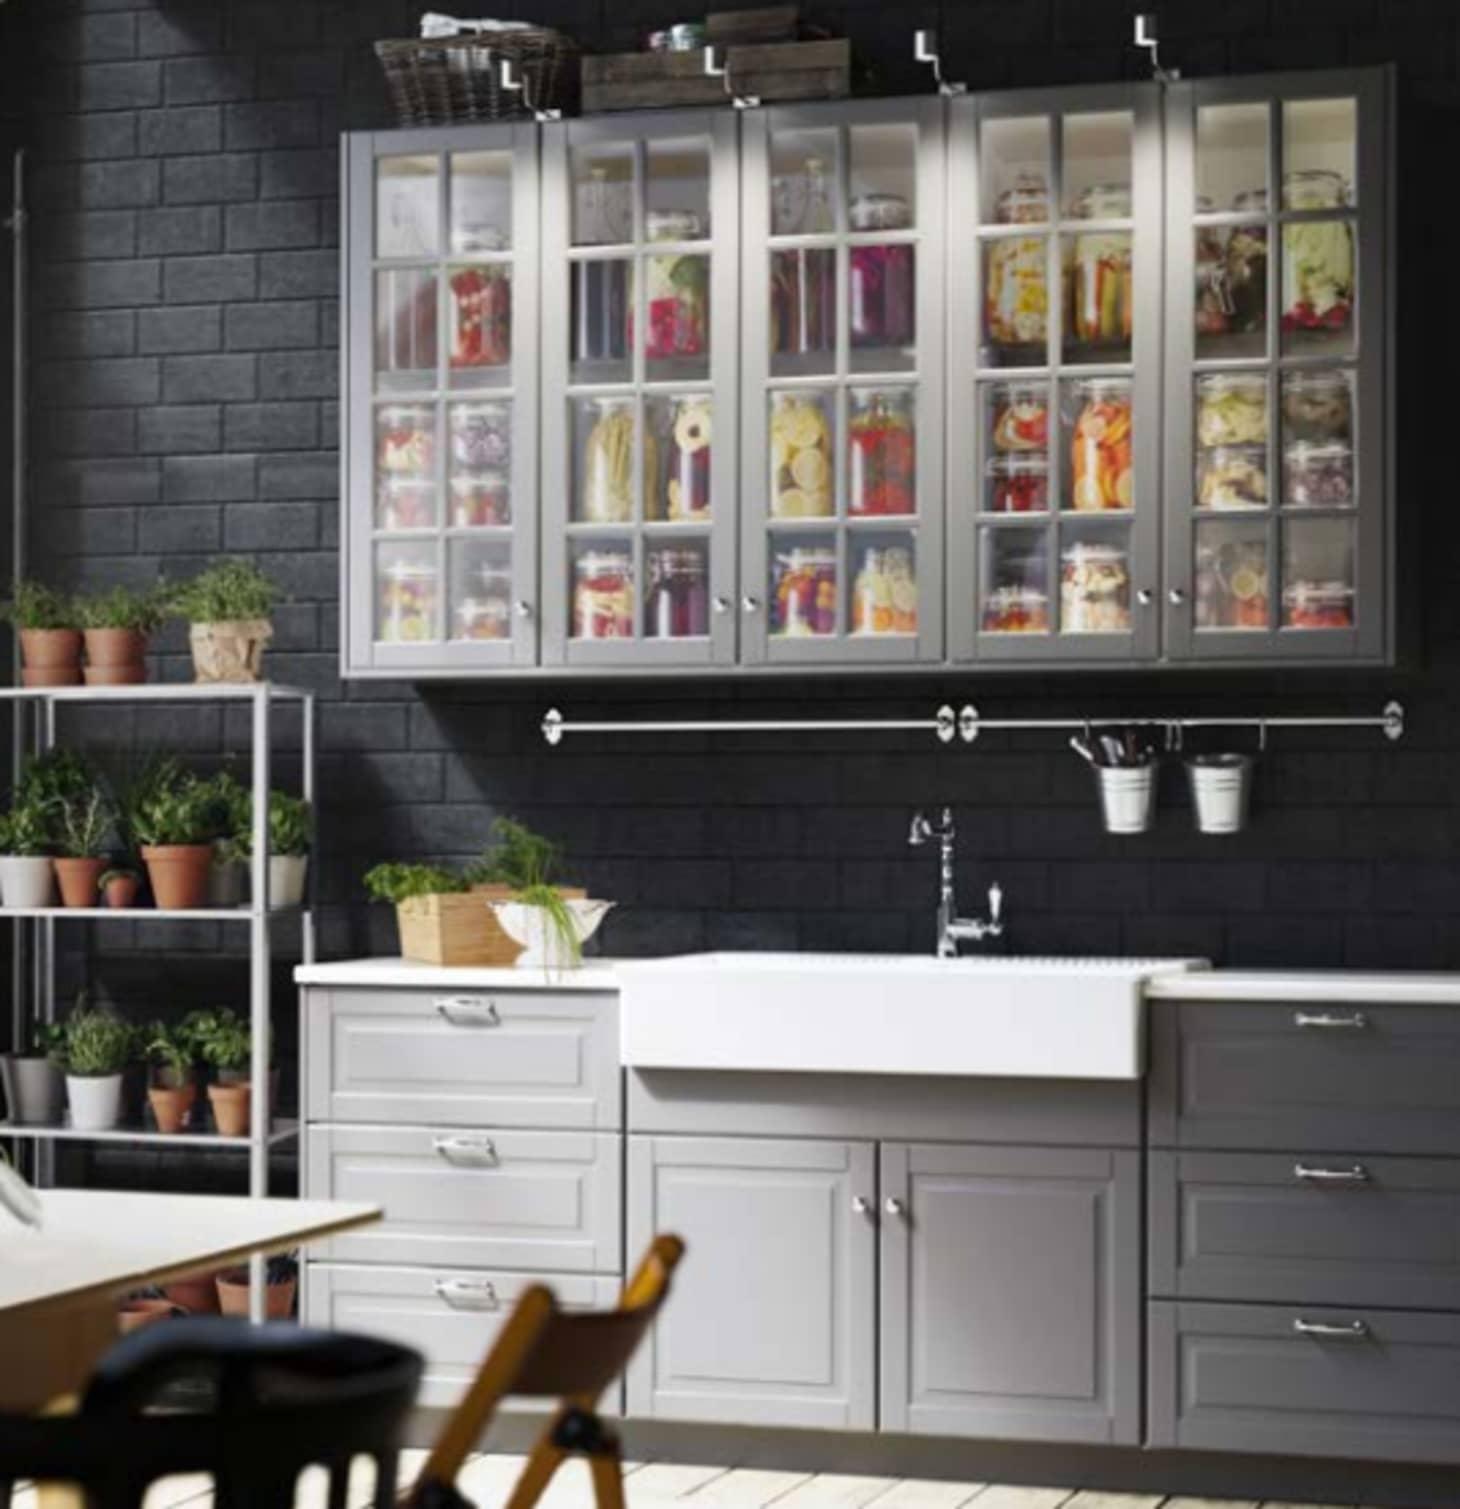 Ikea Kitchen Drawer: IKEA's New SEKTION Cabinets: Sizes, Prices & Photos!